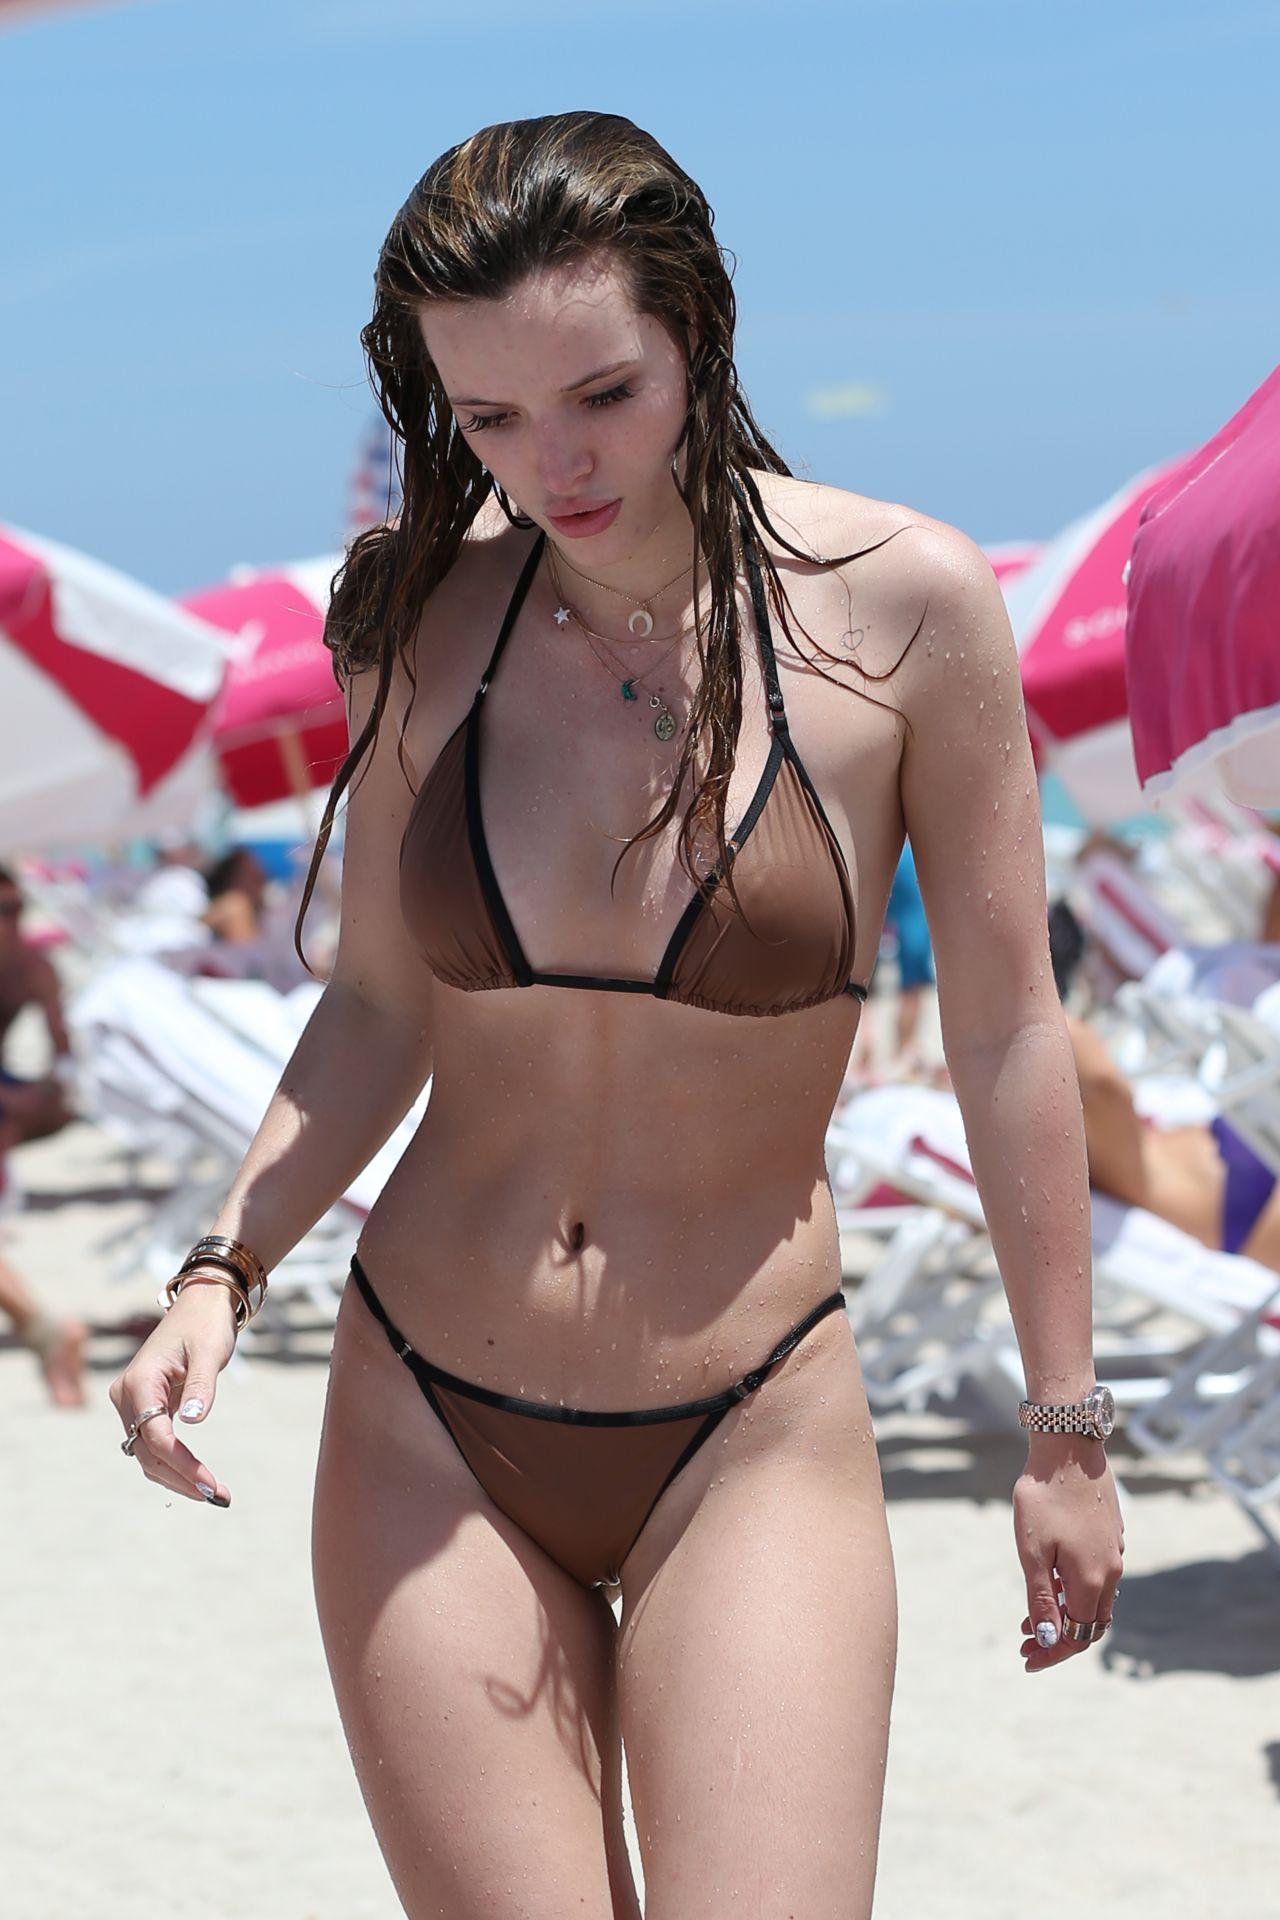 6 The Latina Ray Blu Actresses ThreadPage Forum thrdsQC